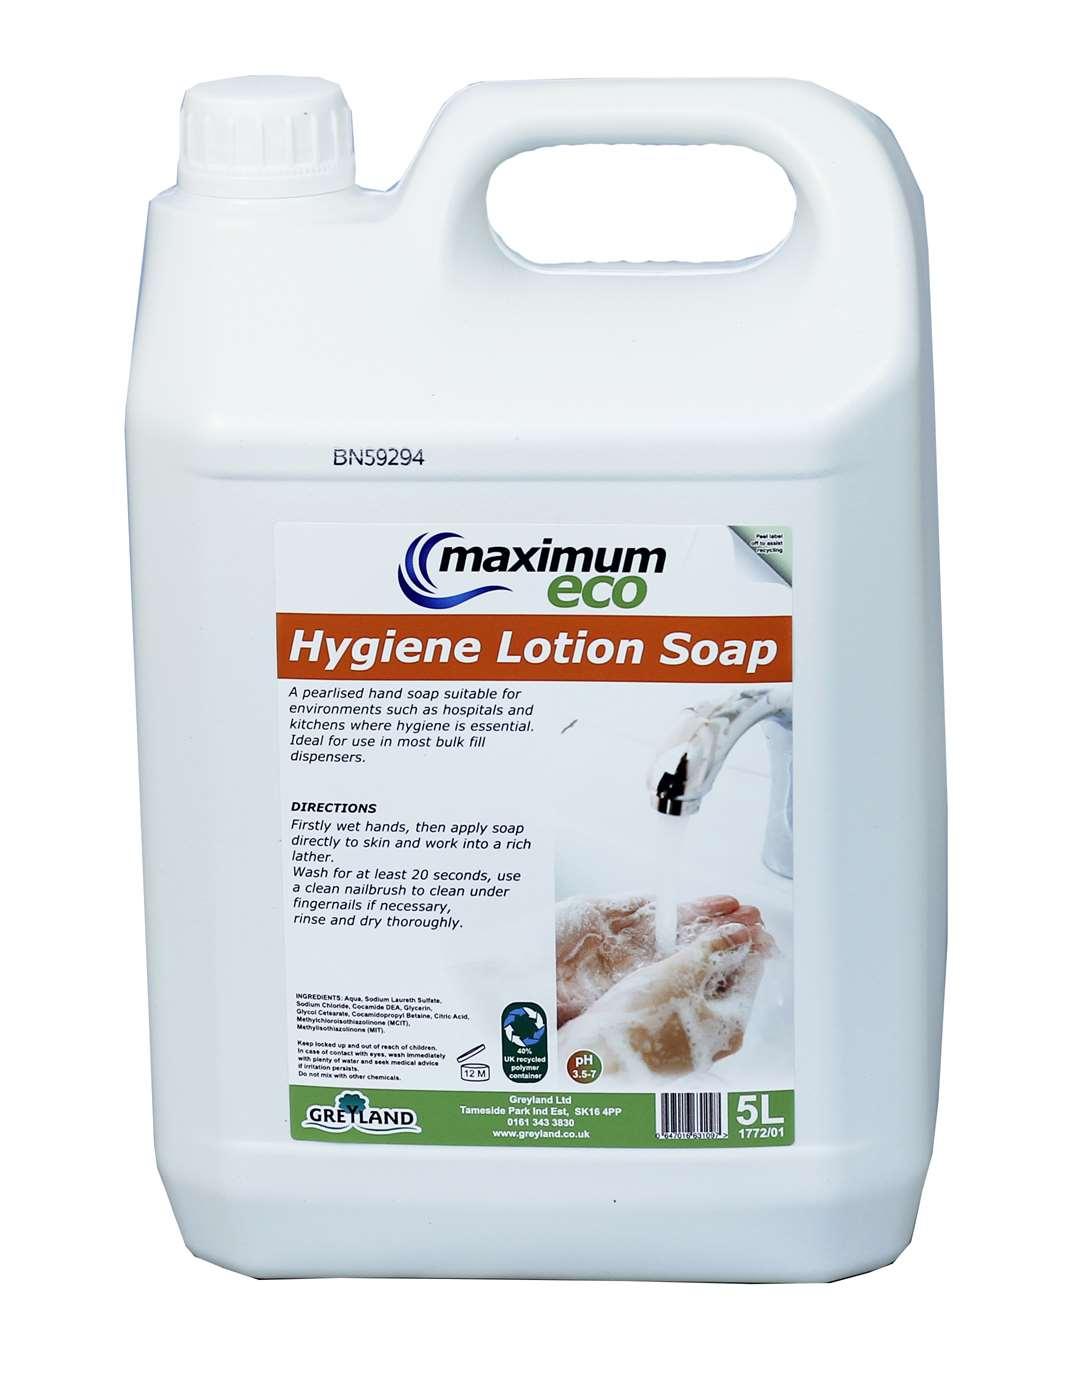 Hygiene Lotion Soap 2 x 5L